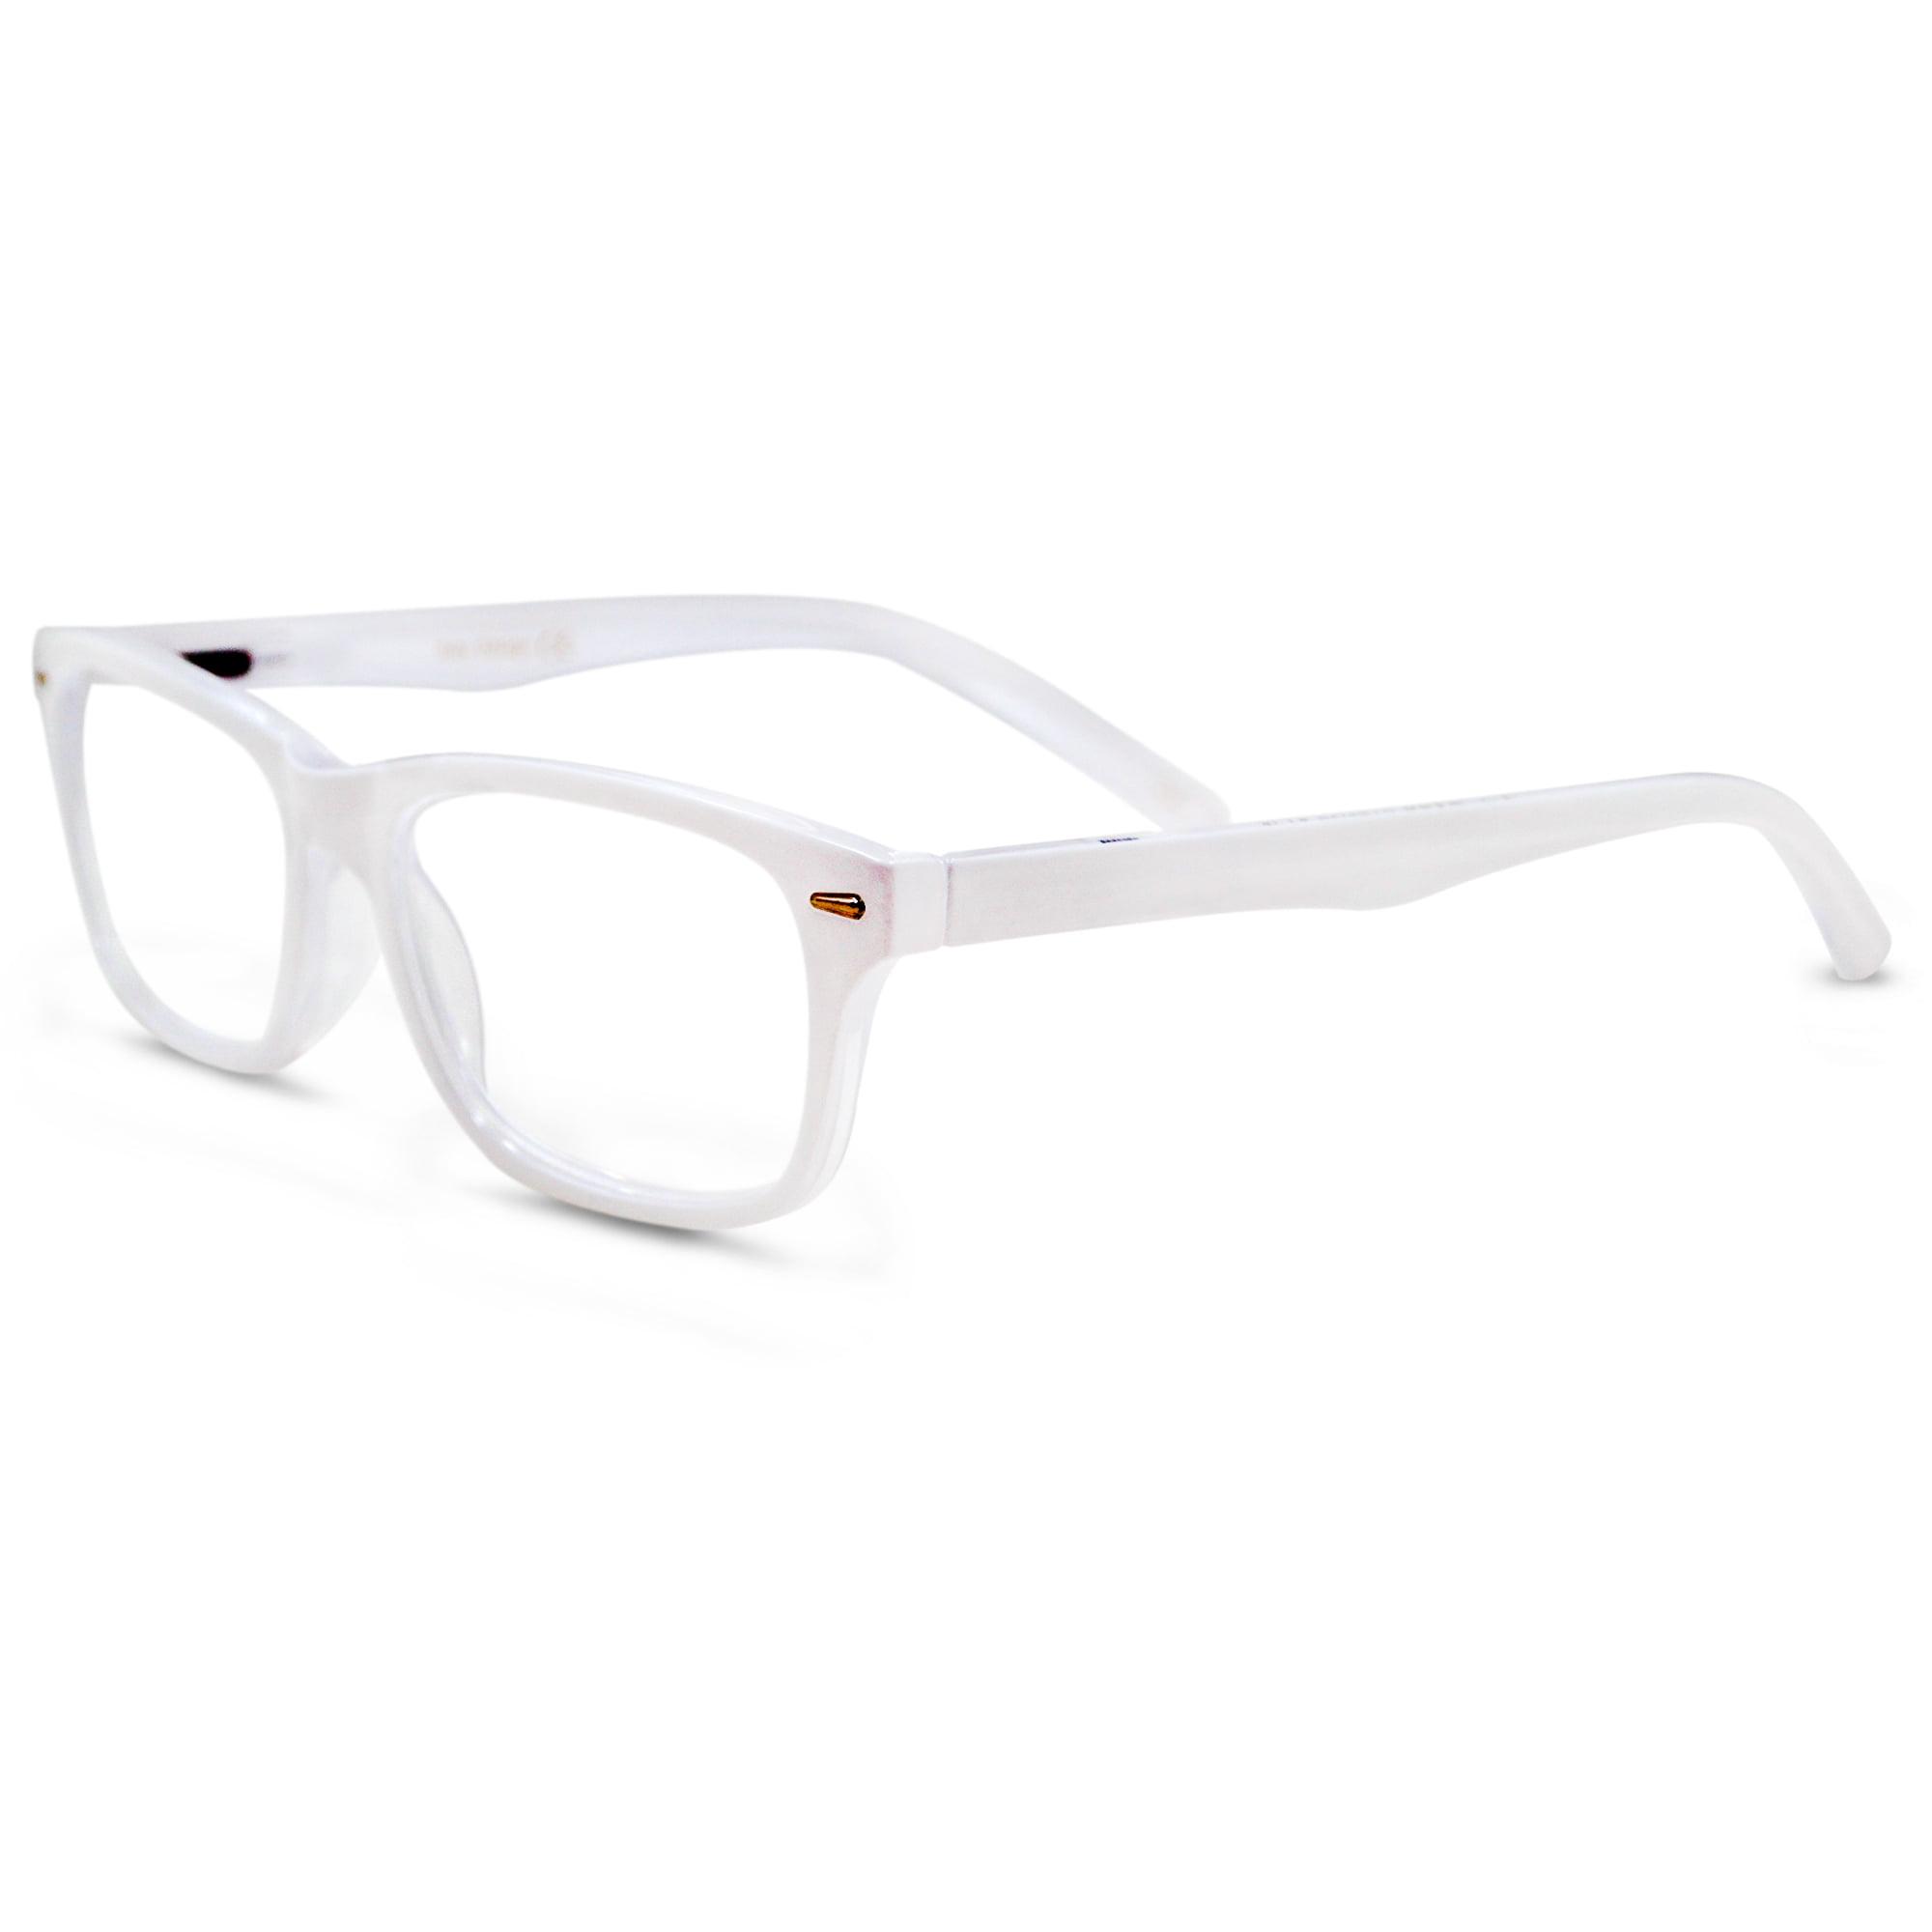 50b07161ce4 In Style Eyes Seymore Retro Reading Glasses. Not Bifocals - Walmart.com